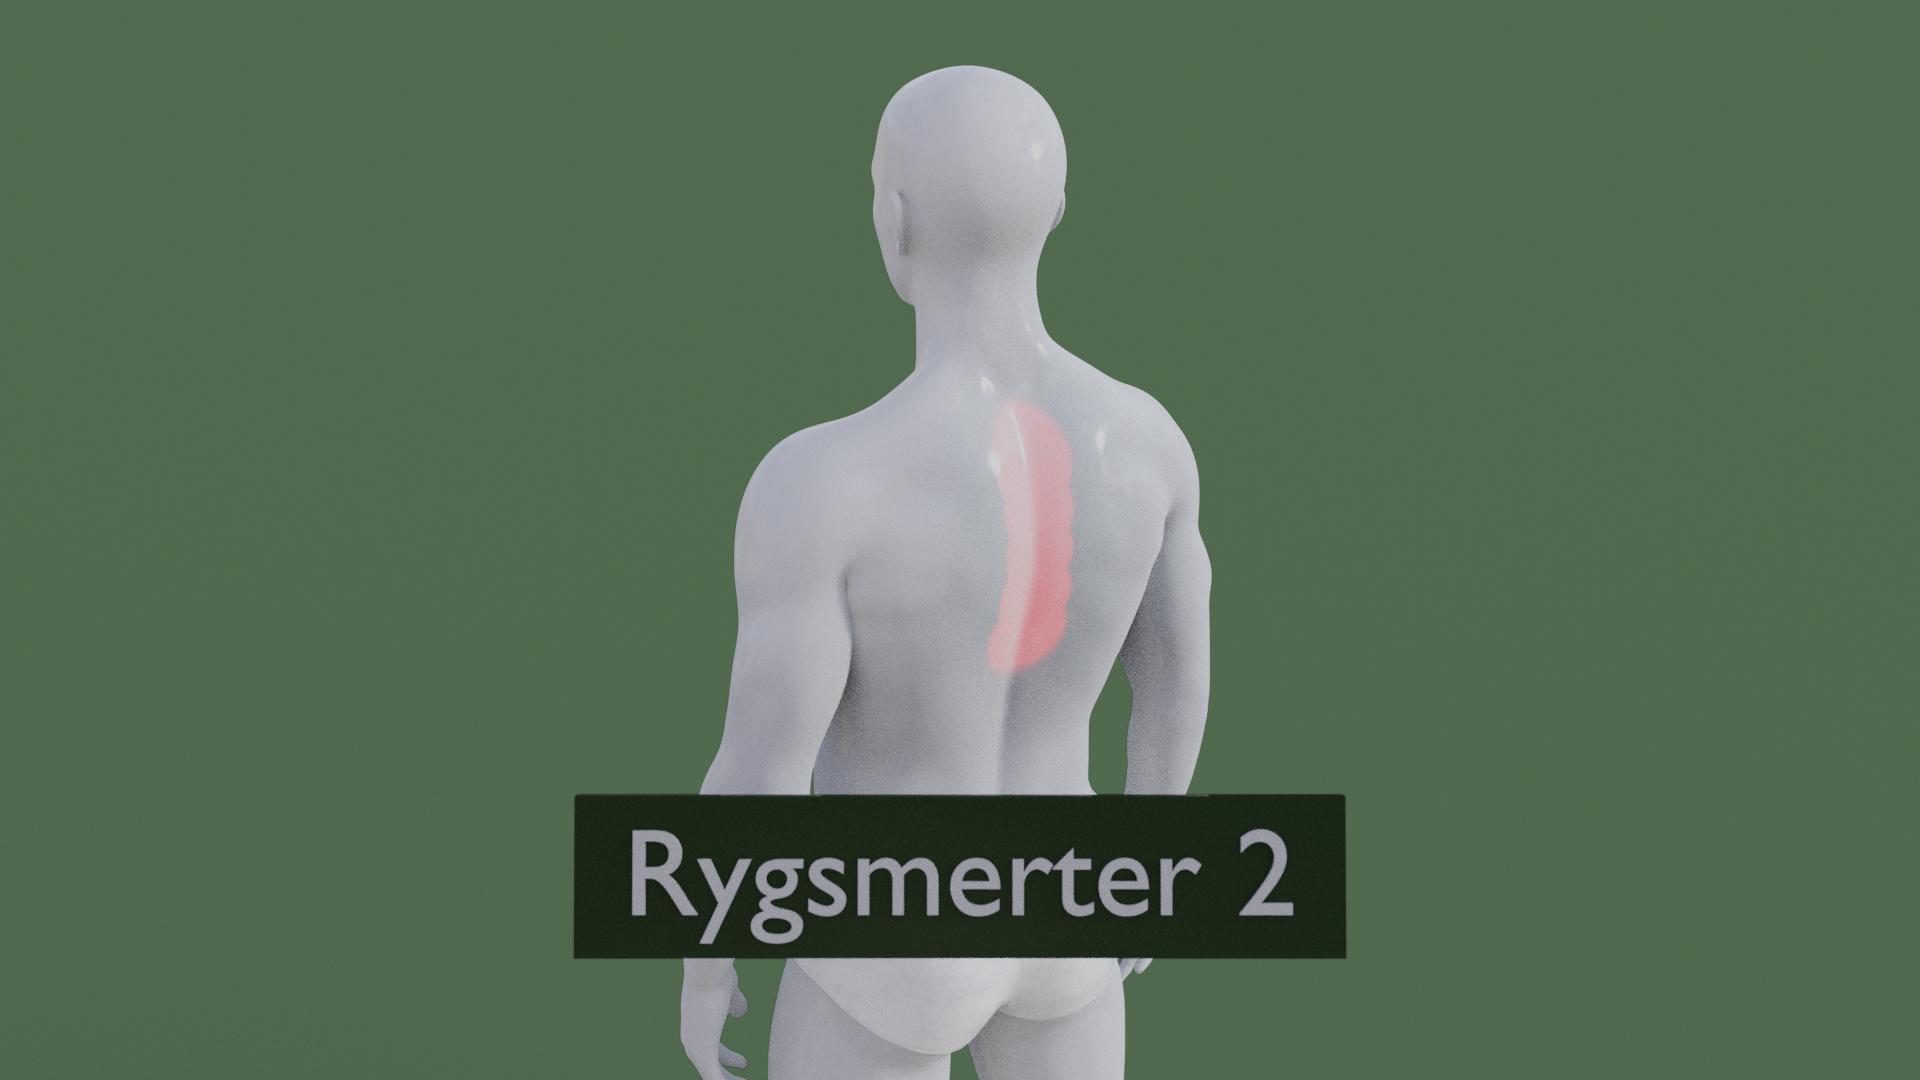 Billedet viser en 3D figur med rygsmerter.